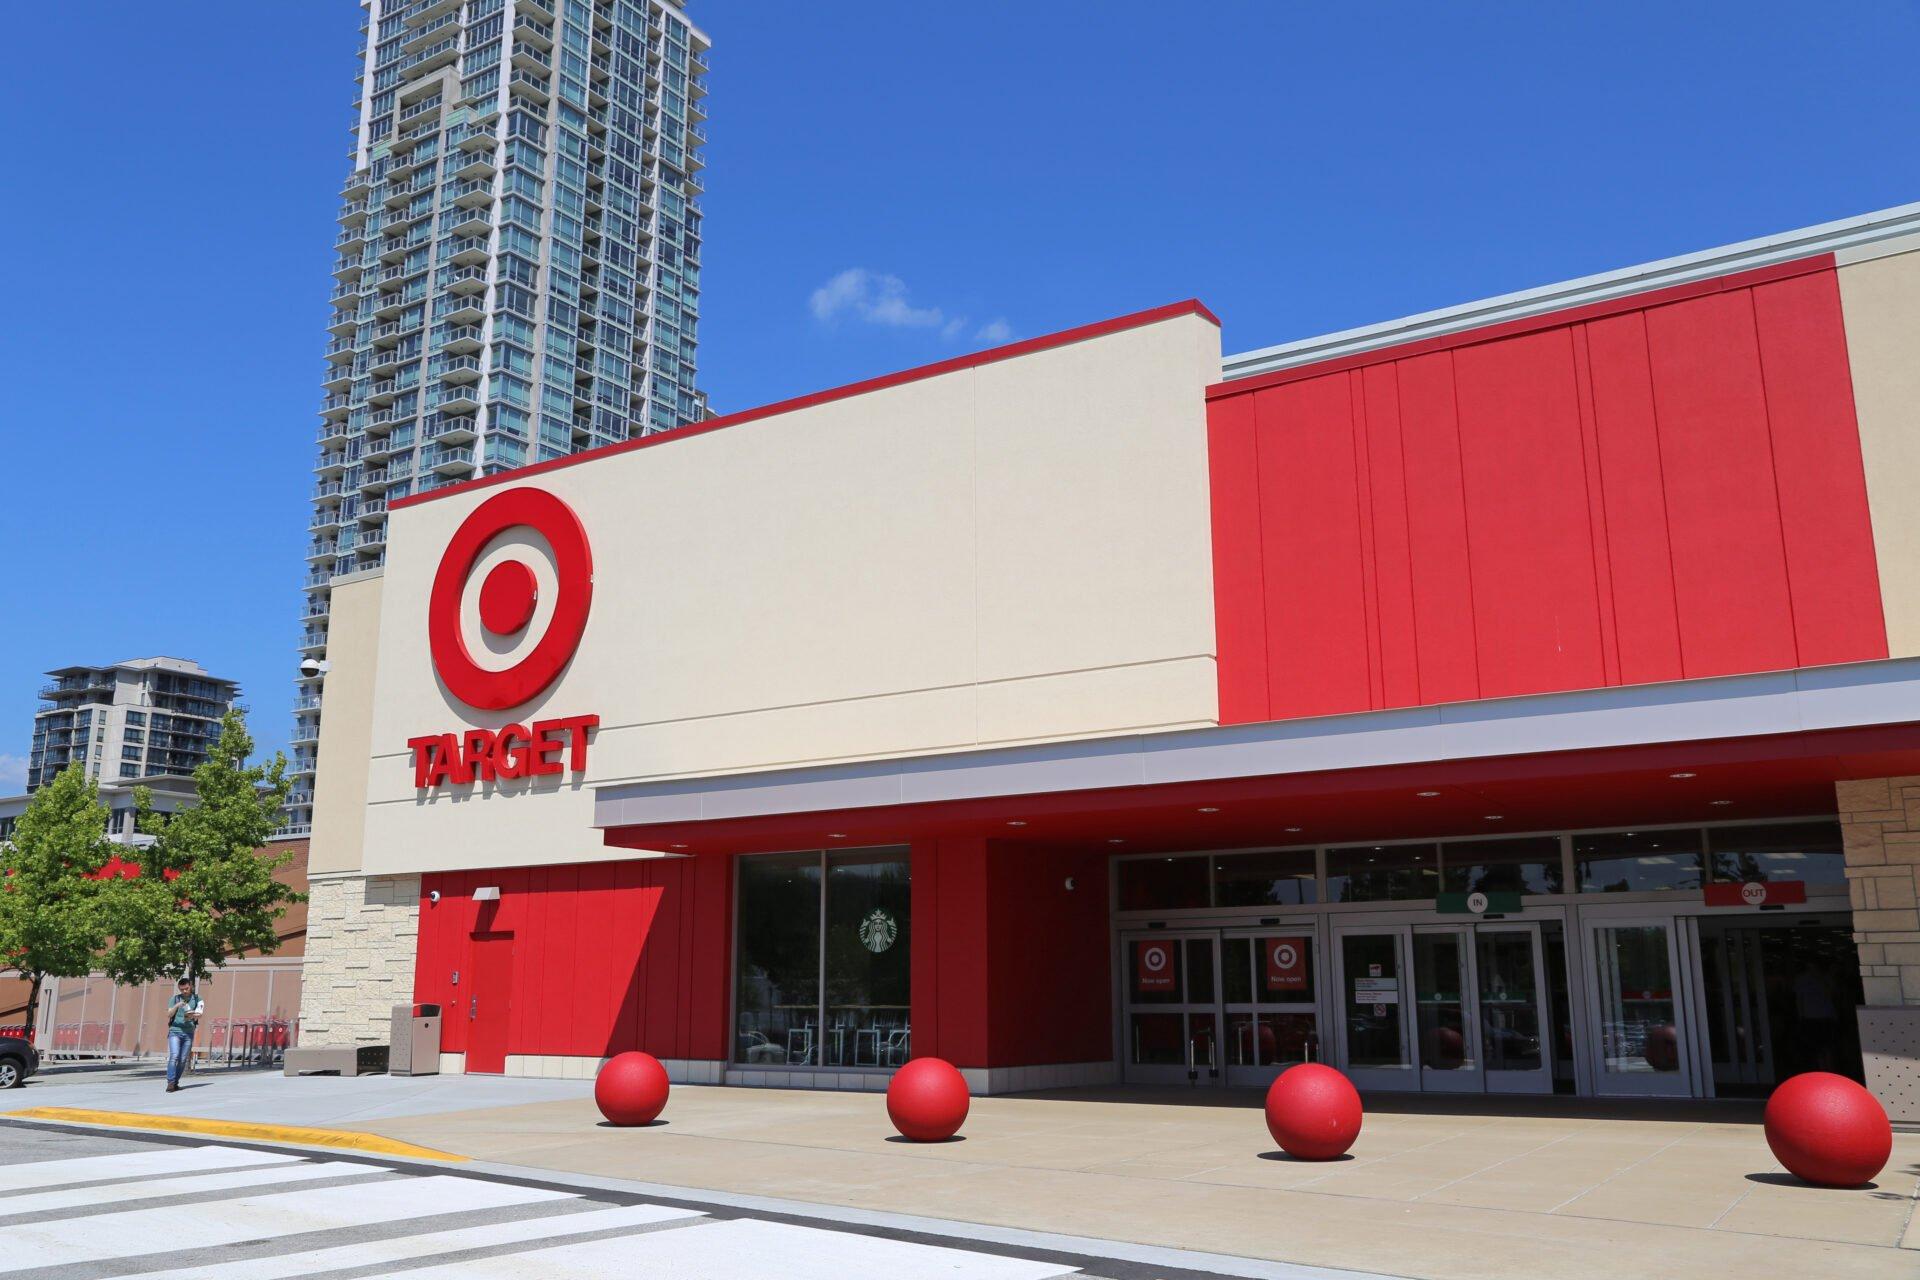 Target superstore in Canada